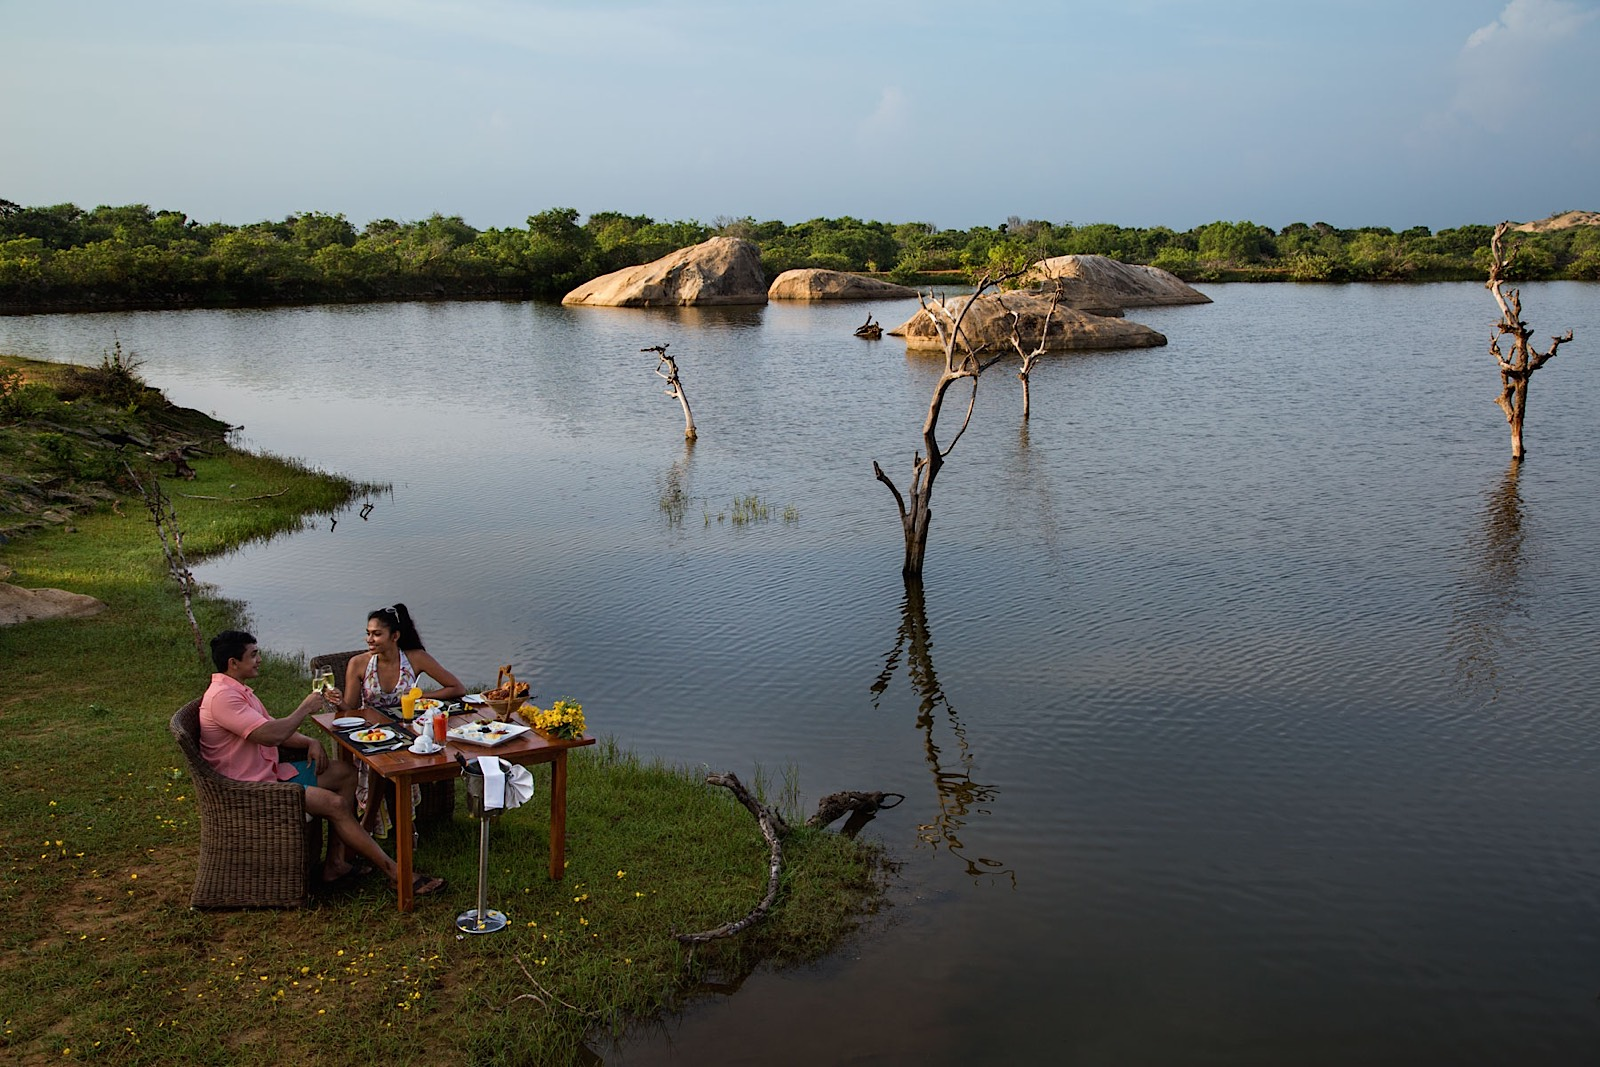 invite-to-paradise-holiday-honeymoon-sri-lanka-specialists-safari-lodge-cinnamon-wild-hotel-8.jpg